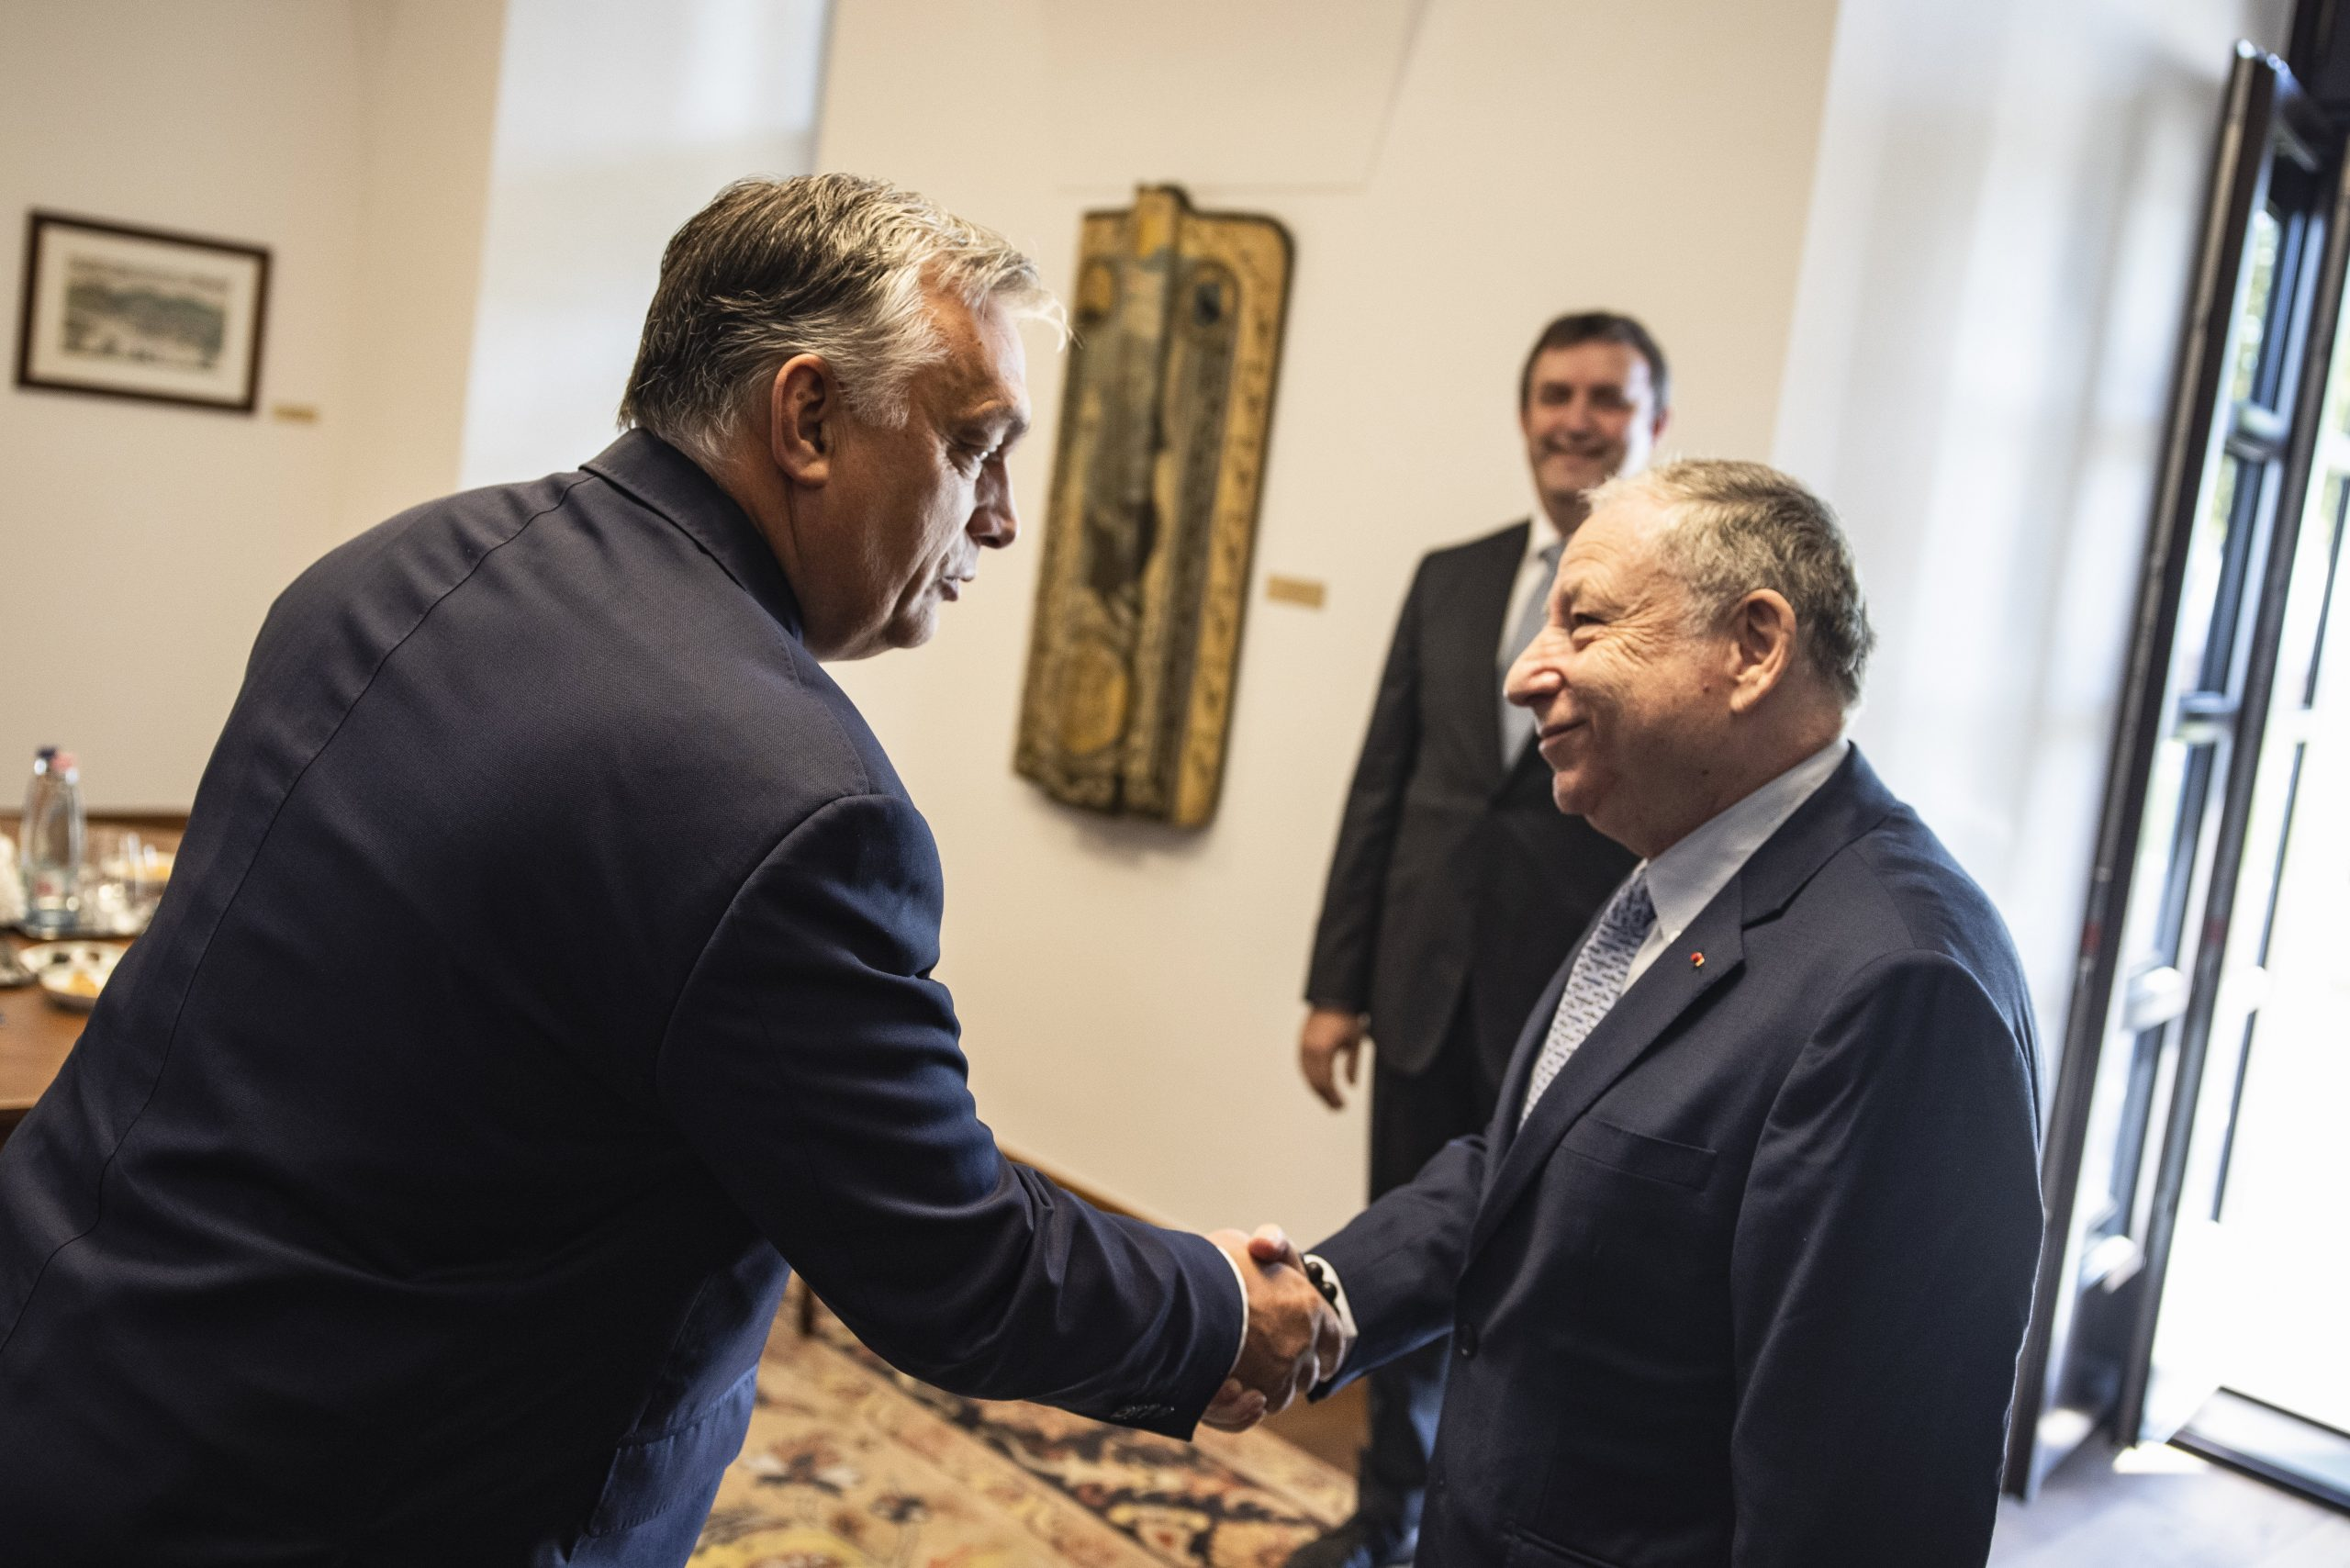 PM Orbán Meets Head of International Automobile Federation